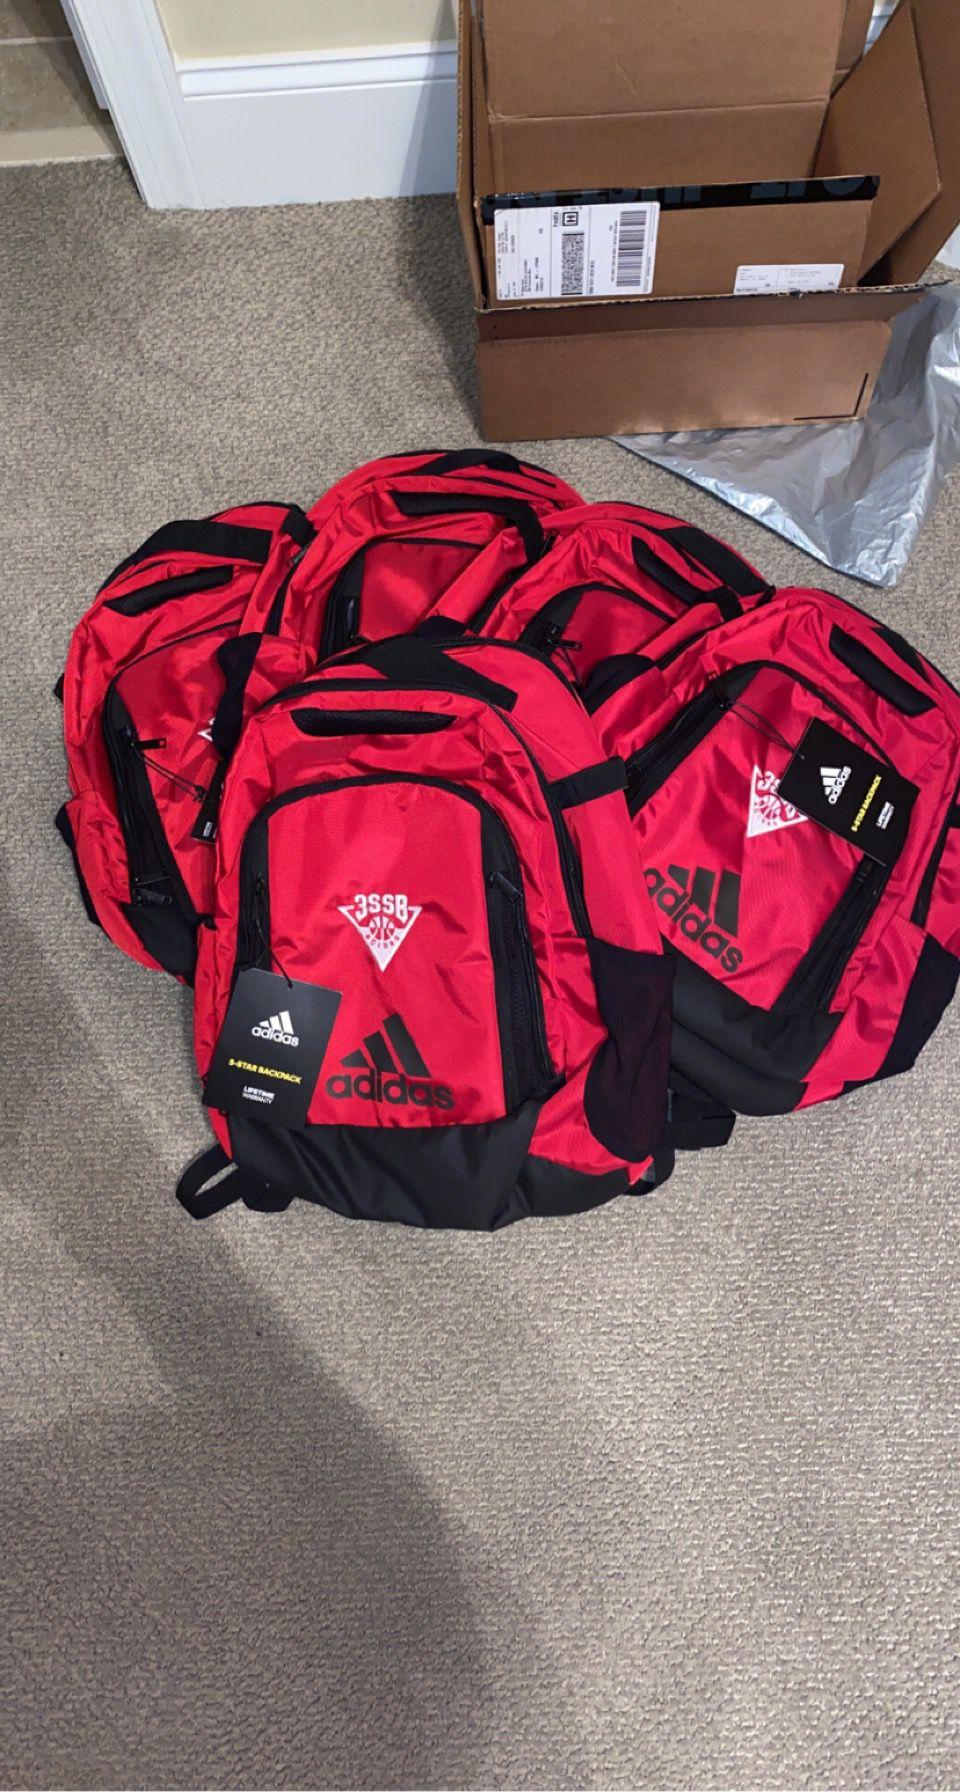 Adidas 3SSB Backpack